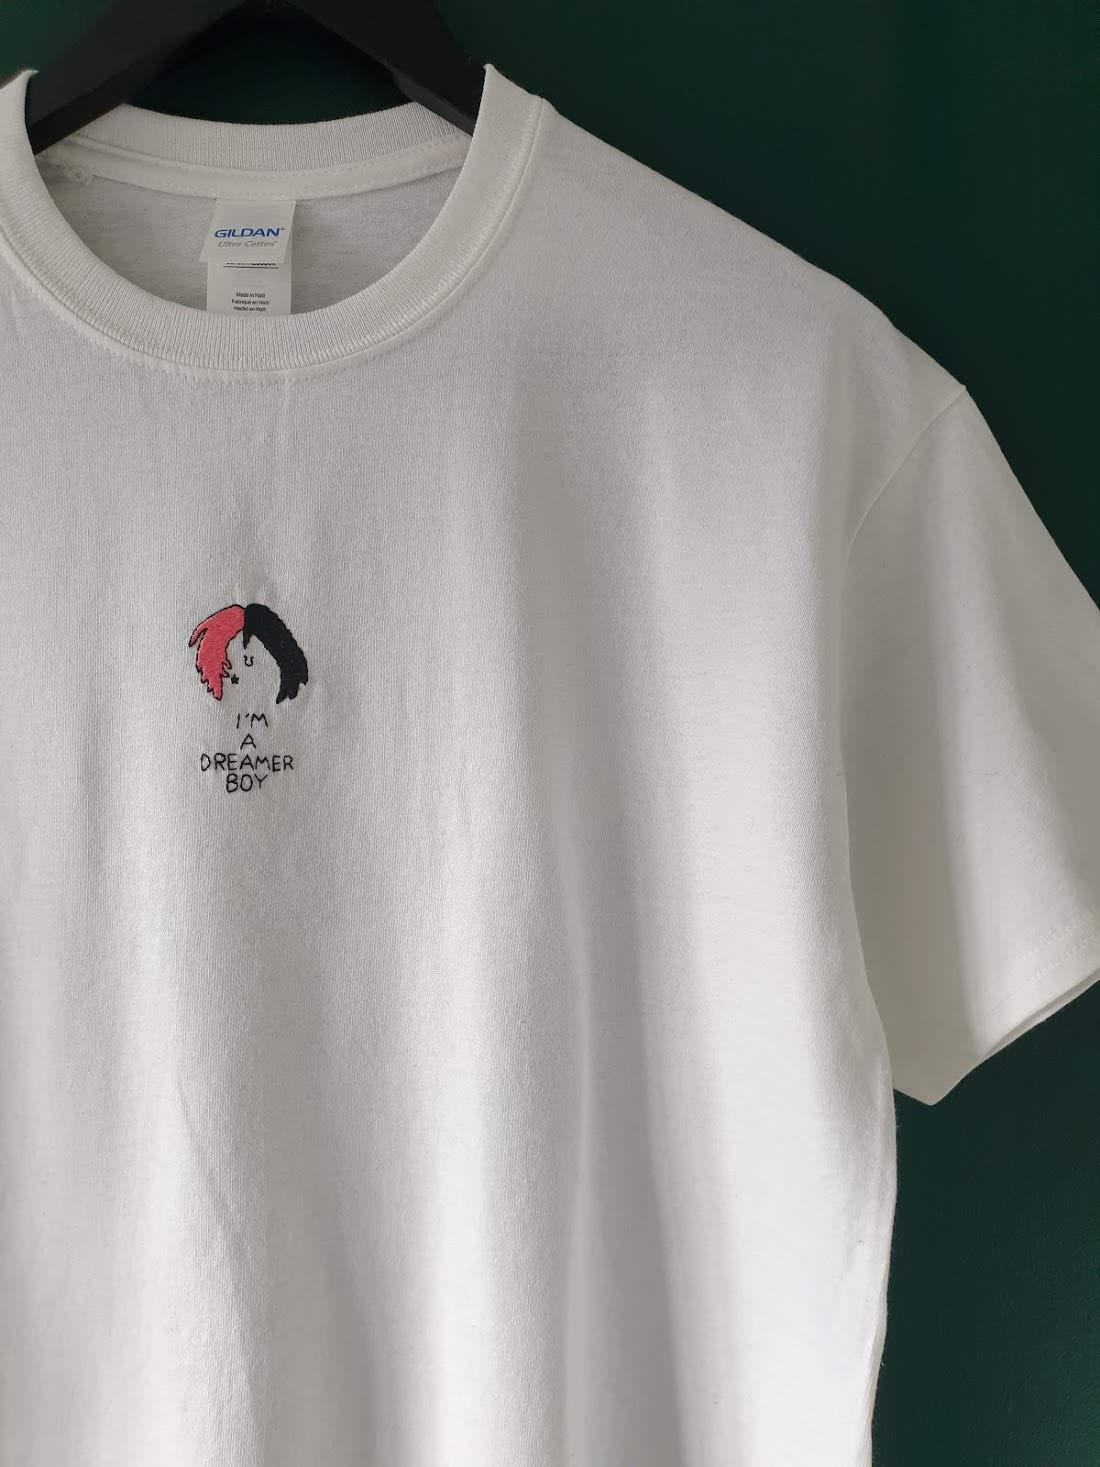 Lil Peep Beamer Boy Lyric T-shirt A5 Print